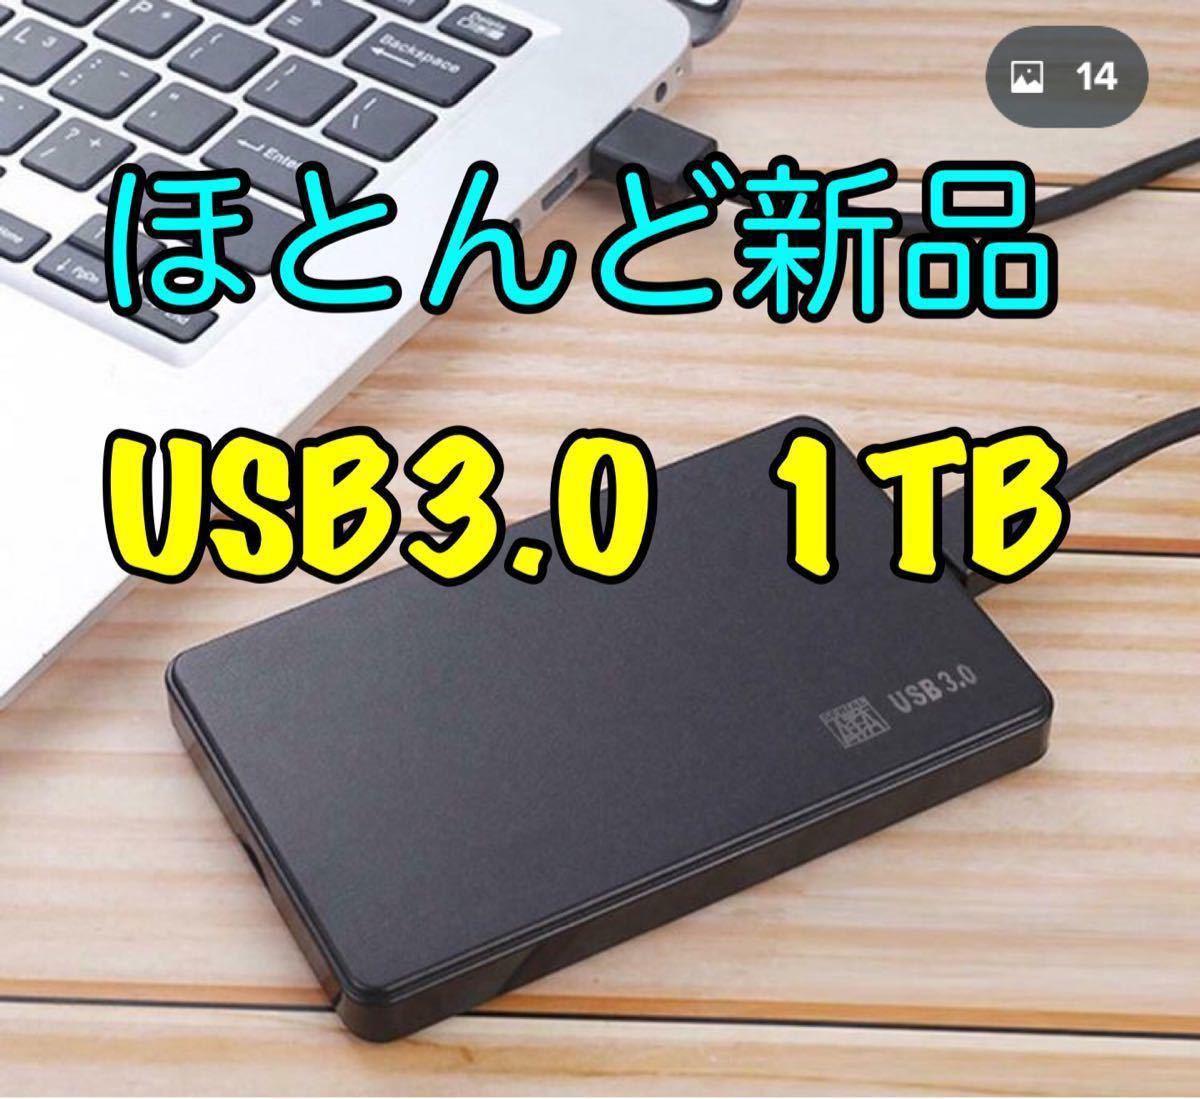 1TB HDD USB3.0 外付 ポータブル ハードディスク 2.5 ケース新品 検査済 電源不要 バスパワー 1000GB